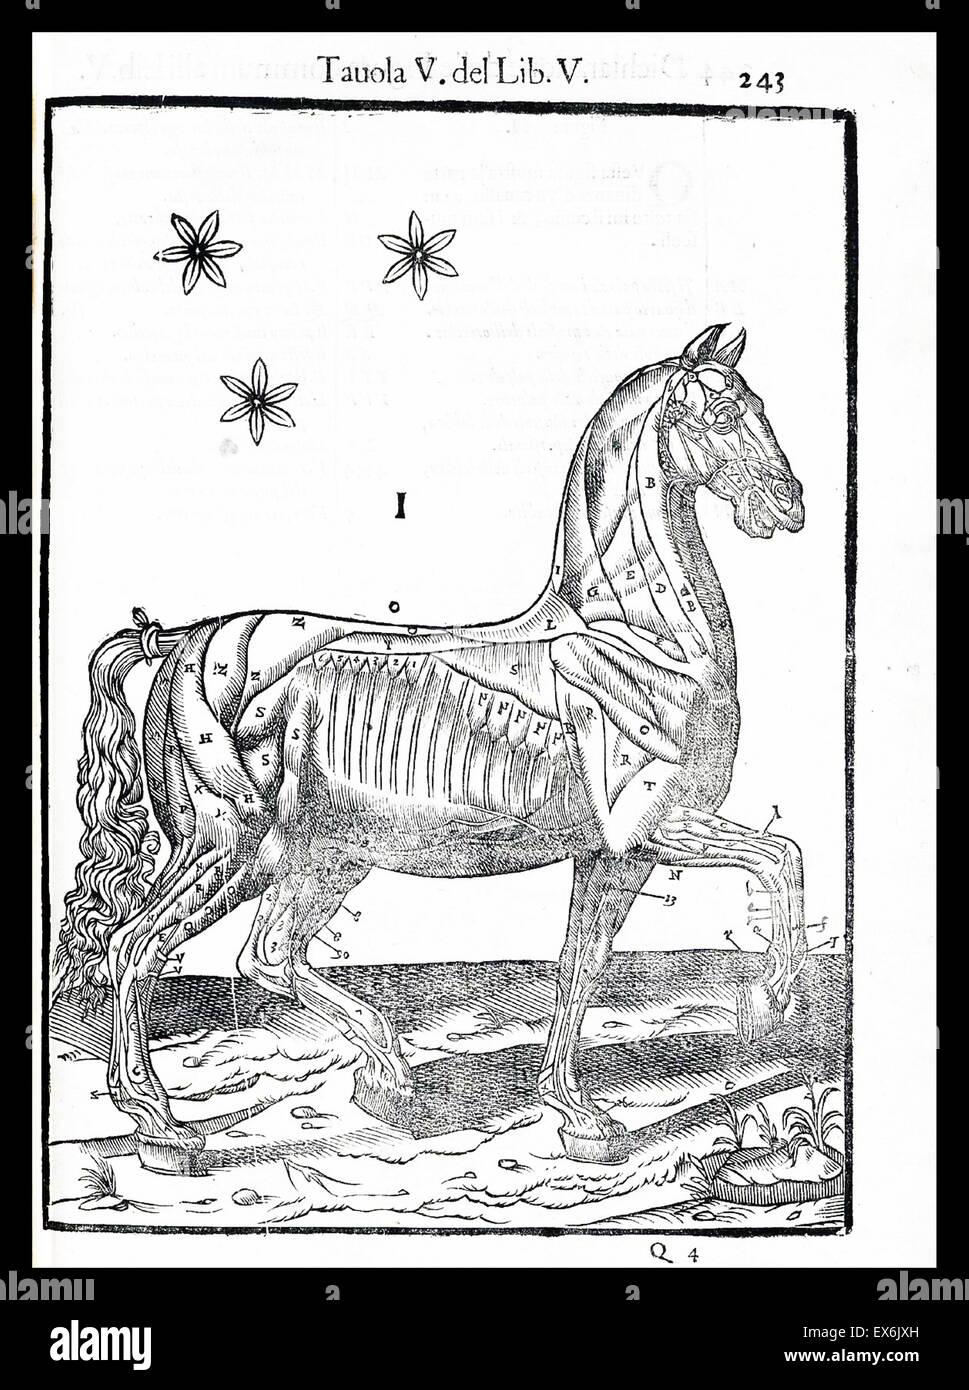 Horse Anatomy Stockfotos & Horse Anatomy Bilder - Alamy